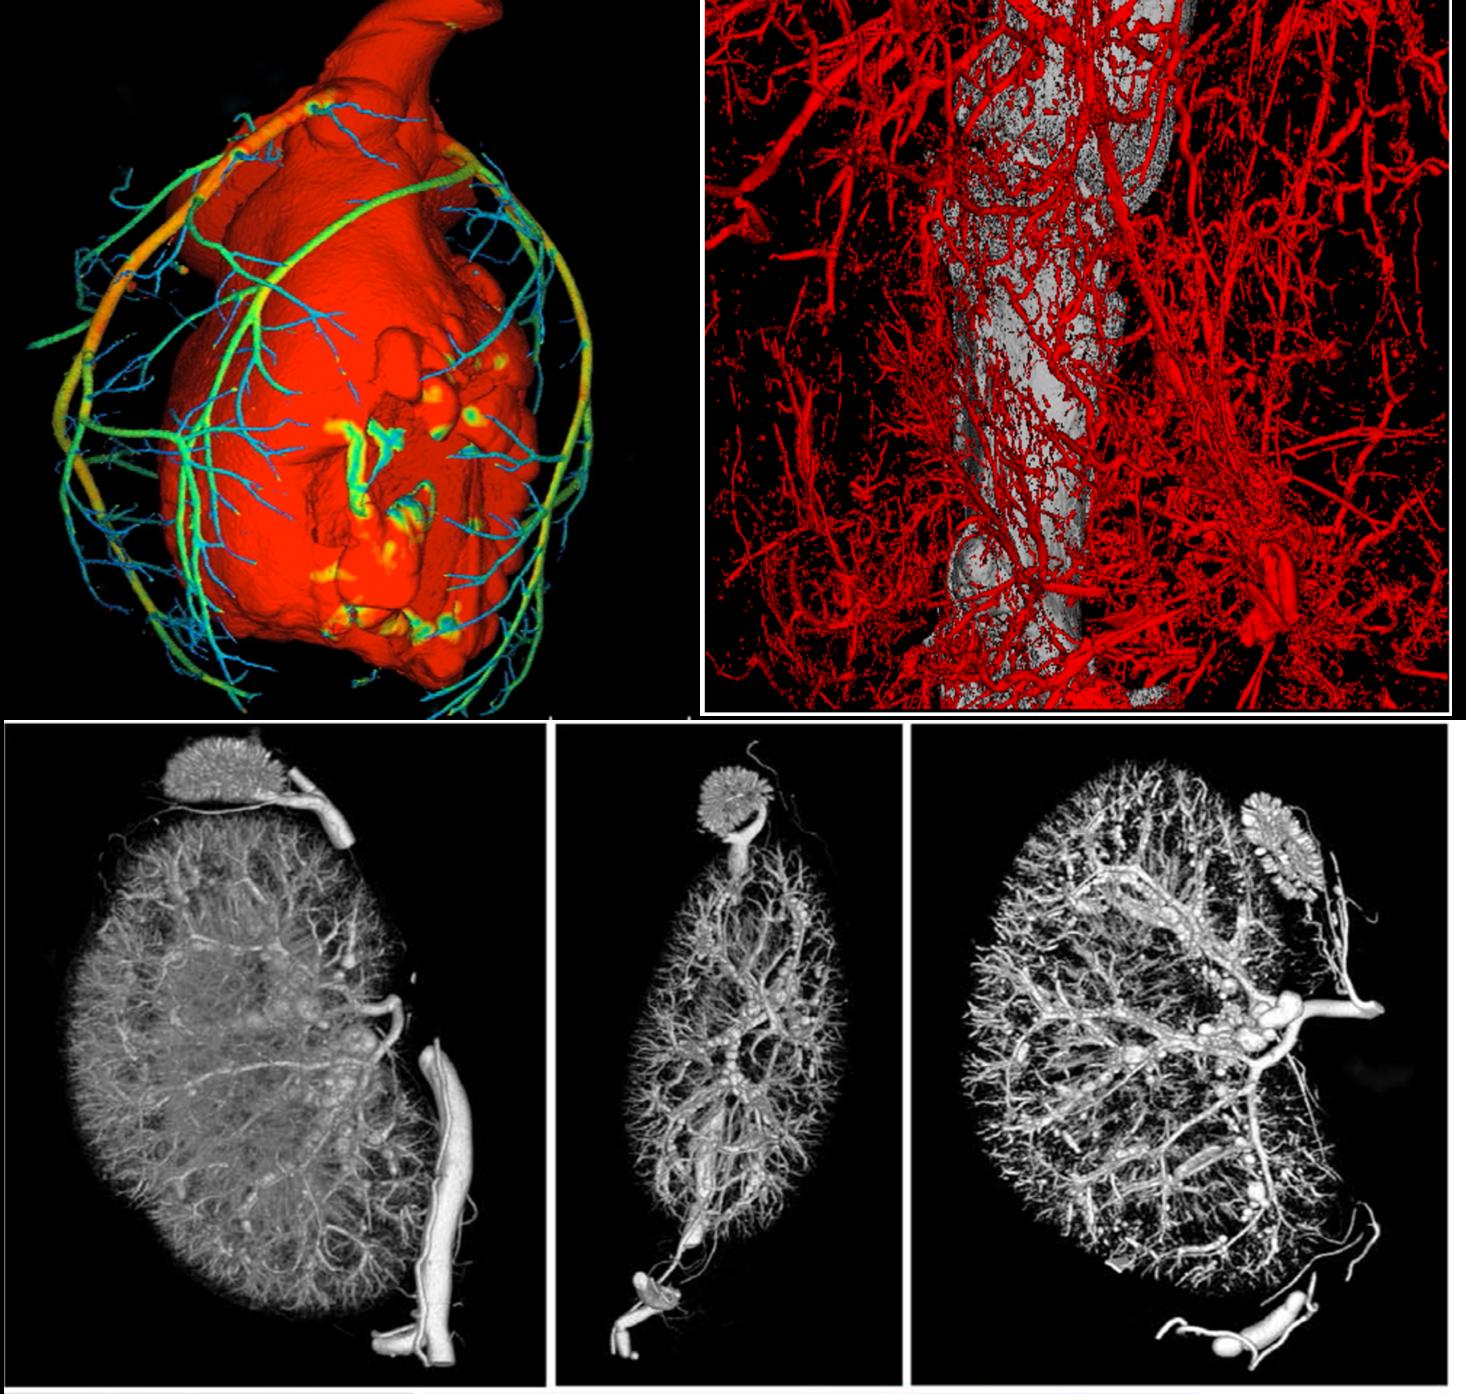 血管 Micro-CT检测 造影剂